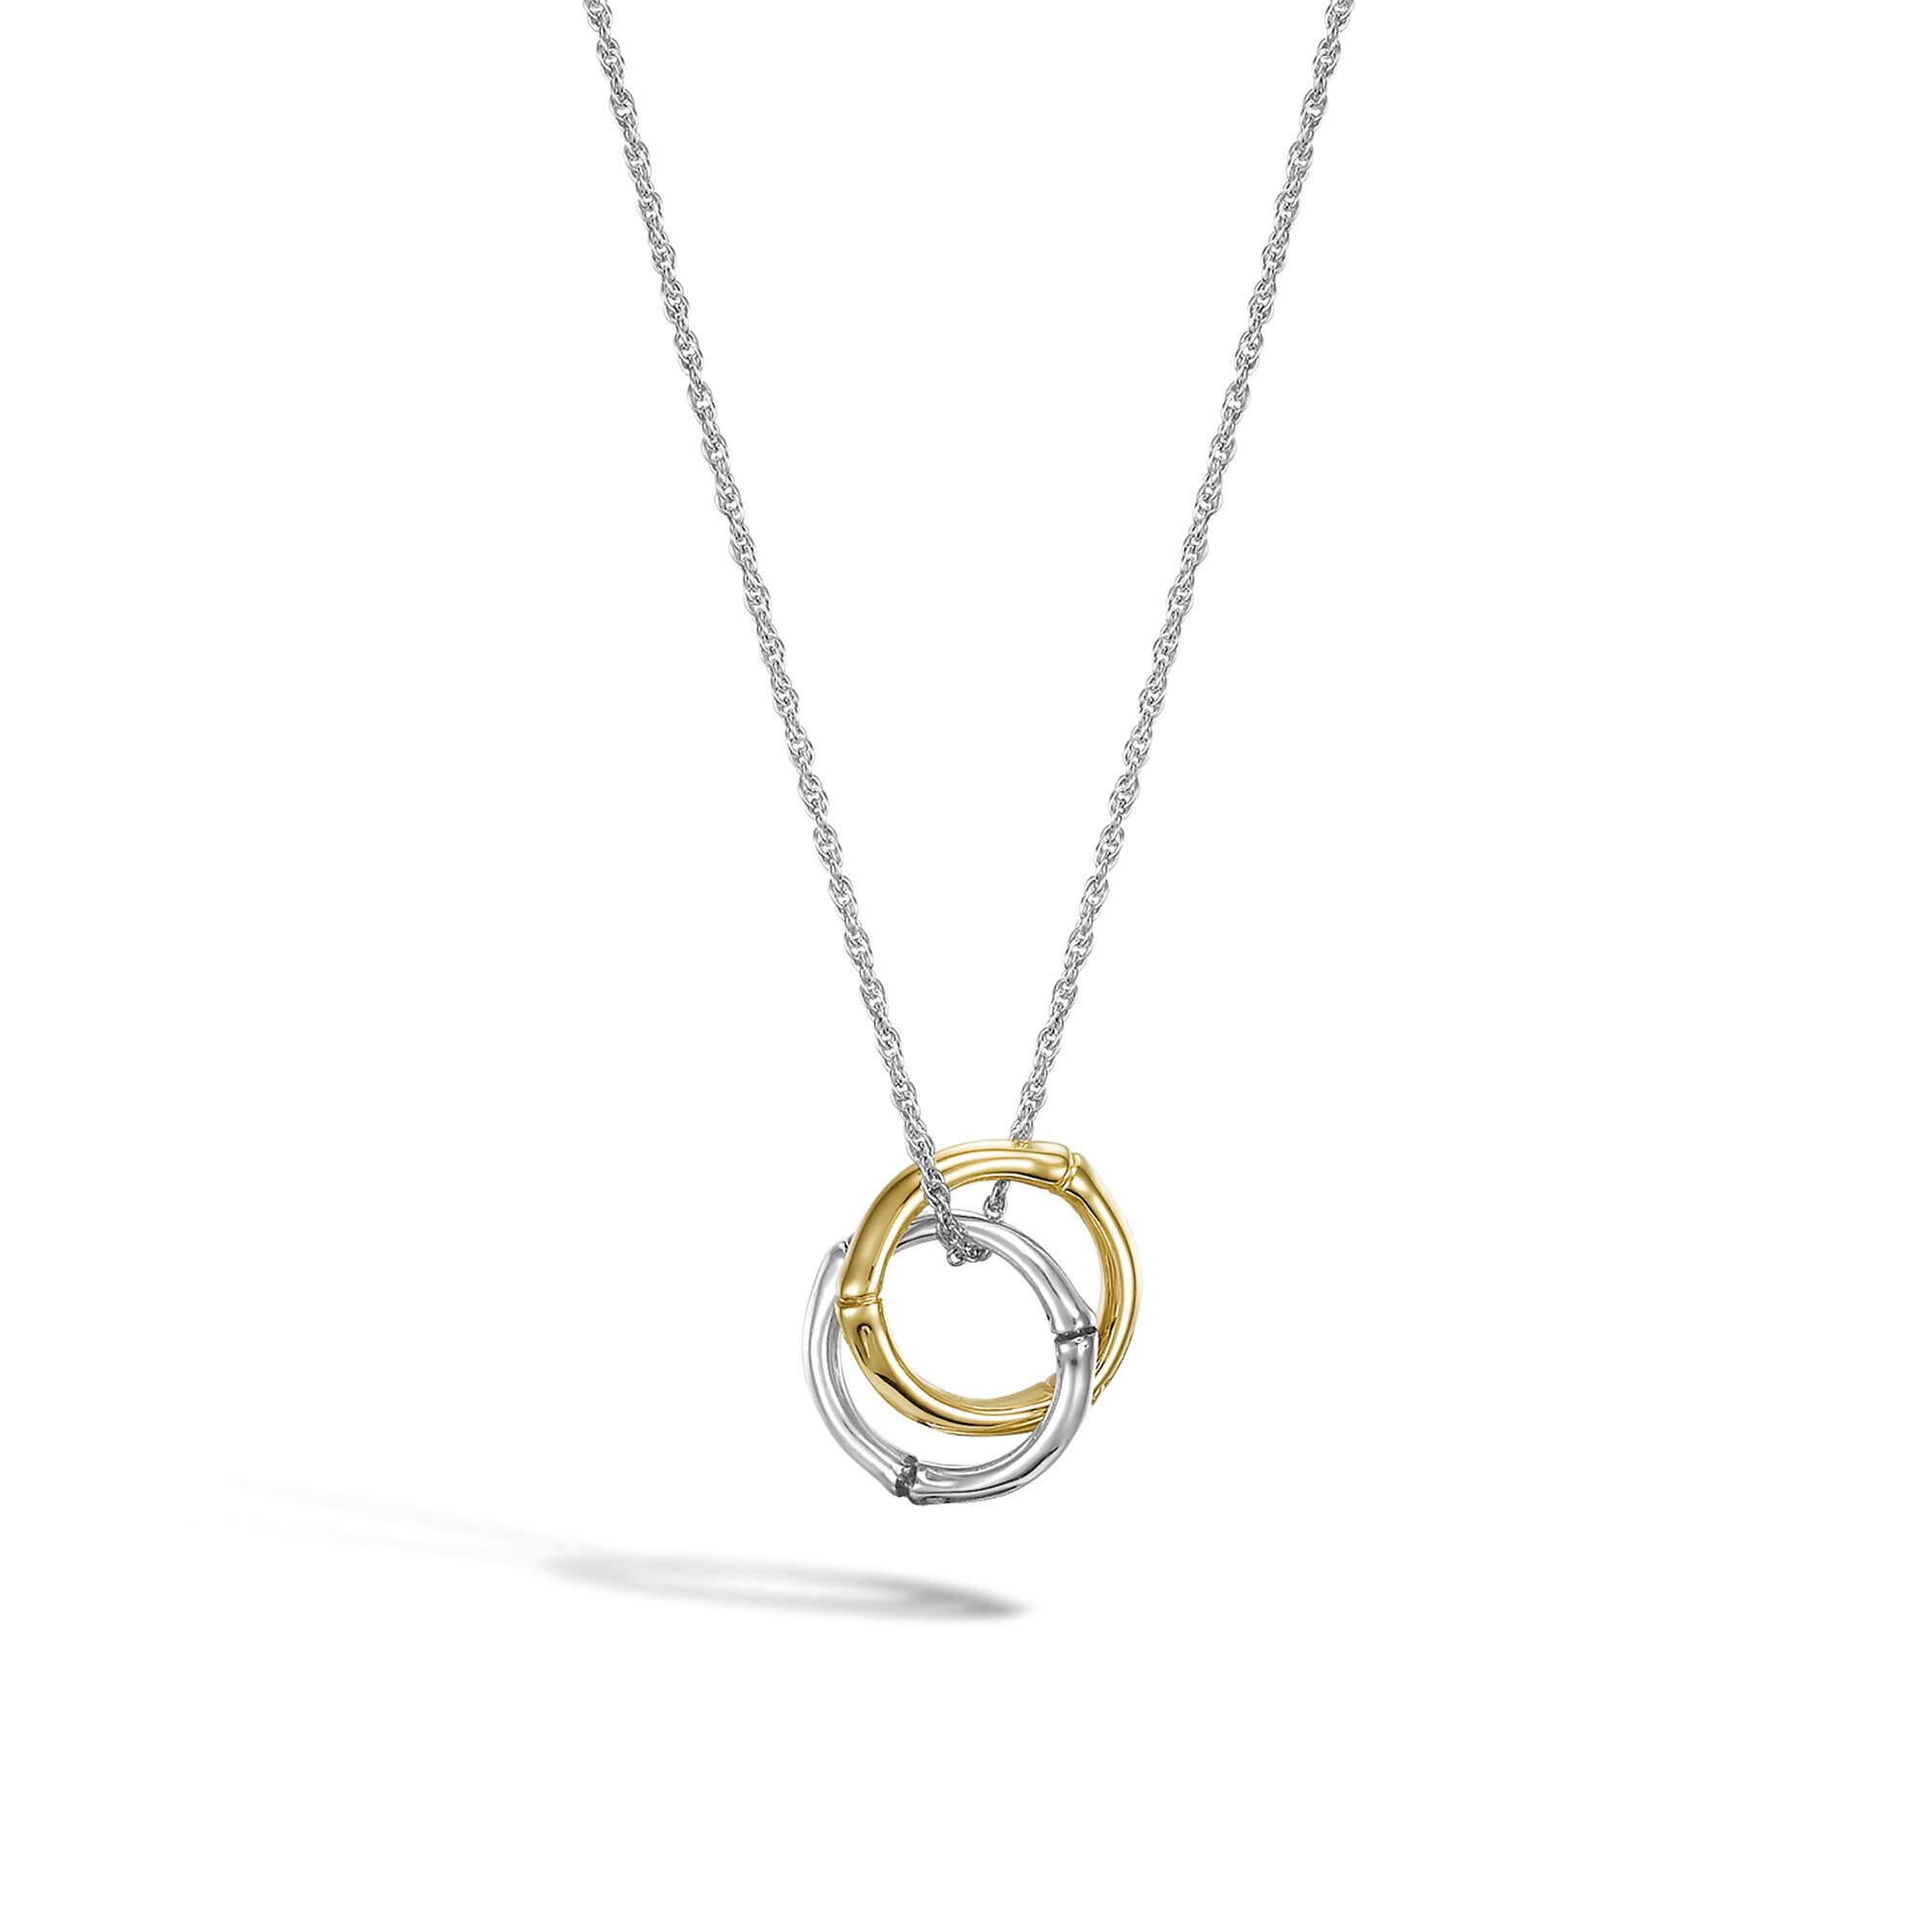 John Hardy Interlinking Pendant Necklace ciacY